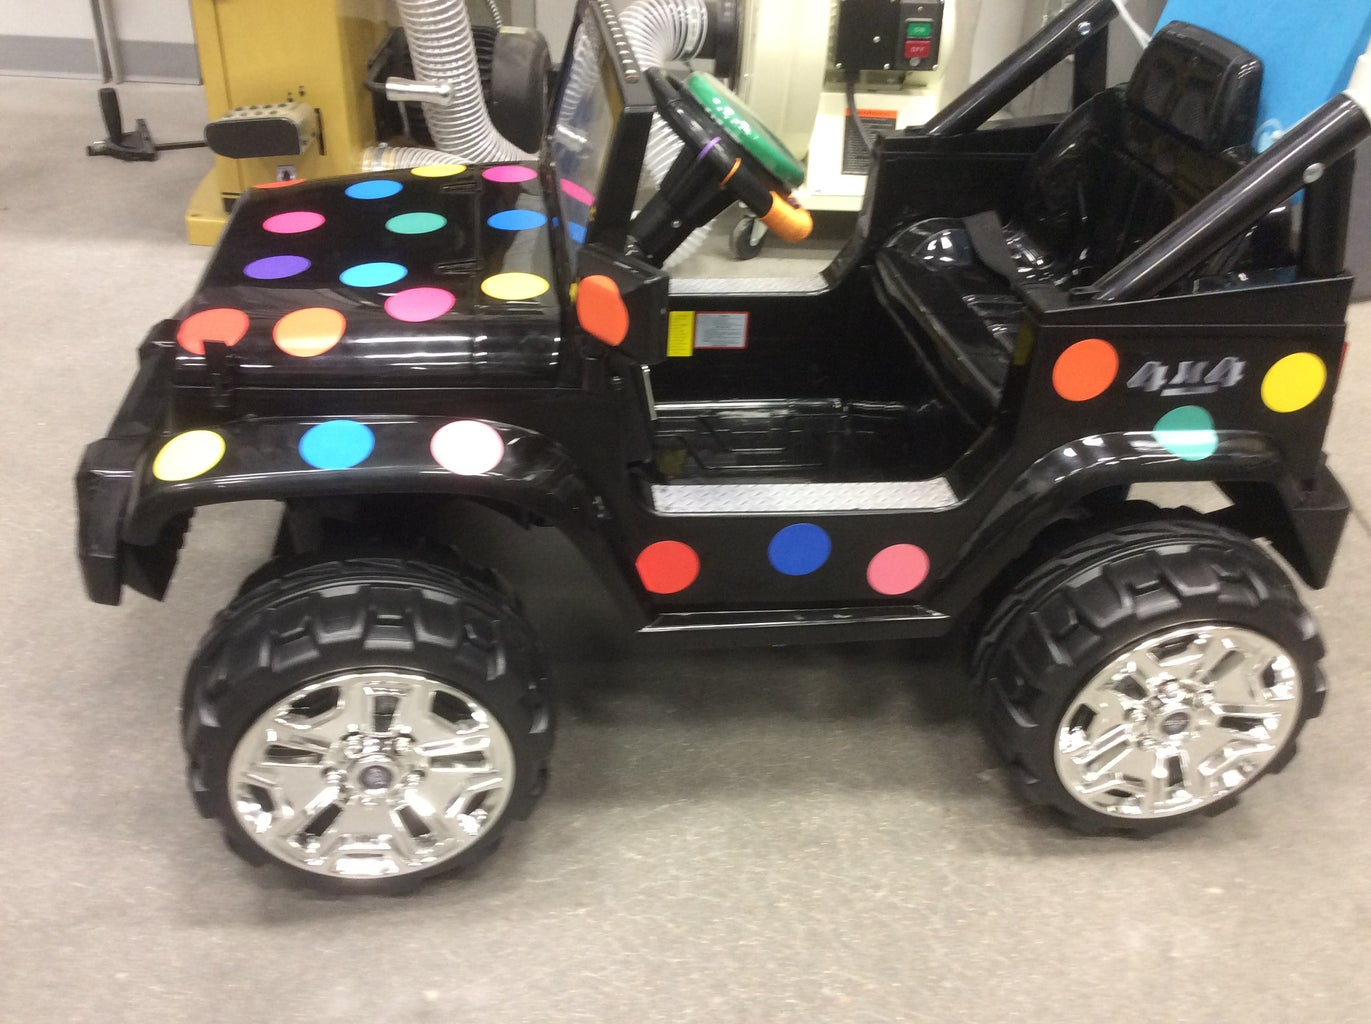 WSU GoBabyGo Modification - Ride on 12V Jeep With Big Mac Switch